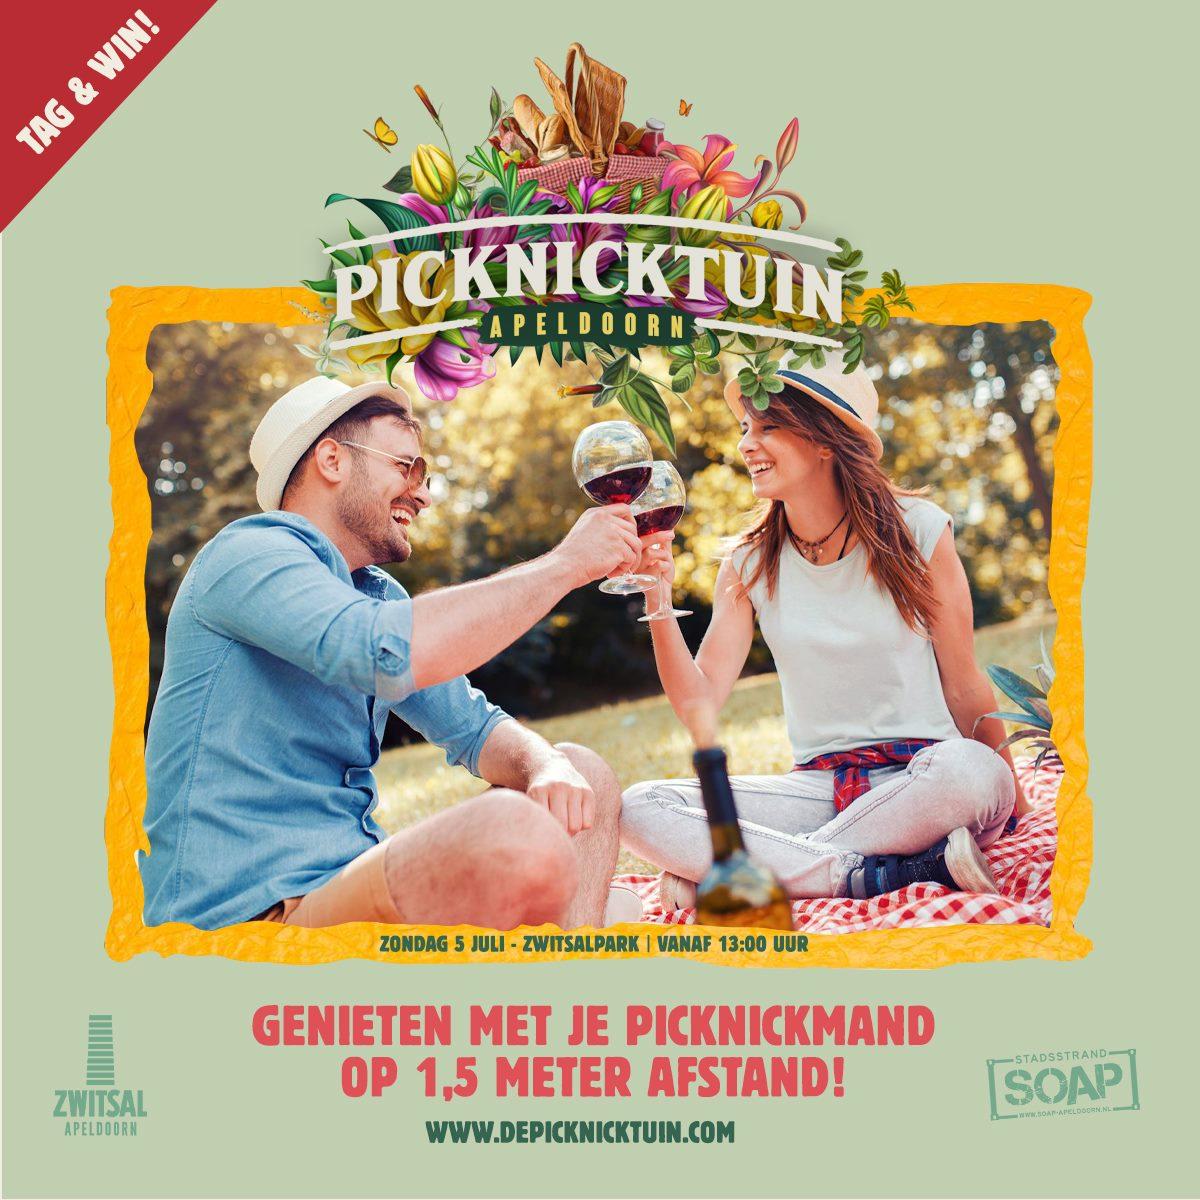 Picknicktuin Apeldoorn